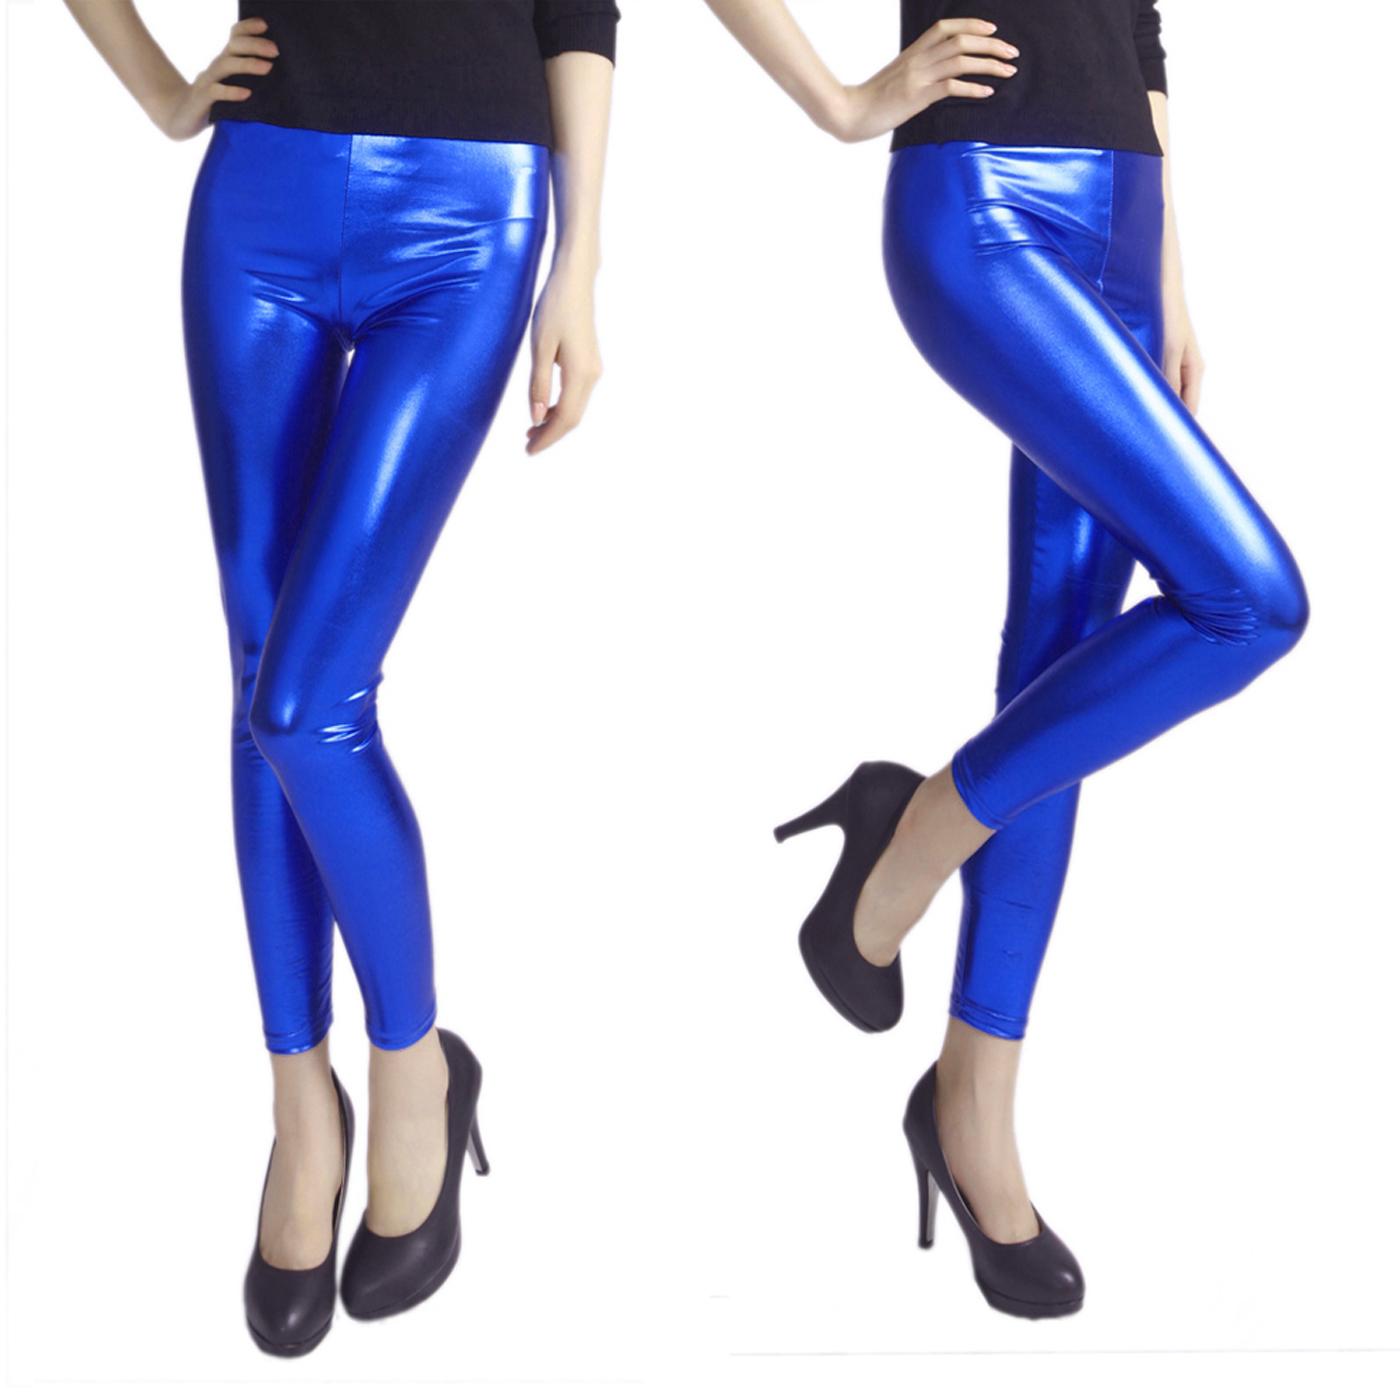 cbbda066c4c HDE - HDE Women Clubwear Shiny Liquid Wet Look Metallic Stretch Leggings  (Hot Pink, Small) - Walmart.com